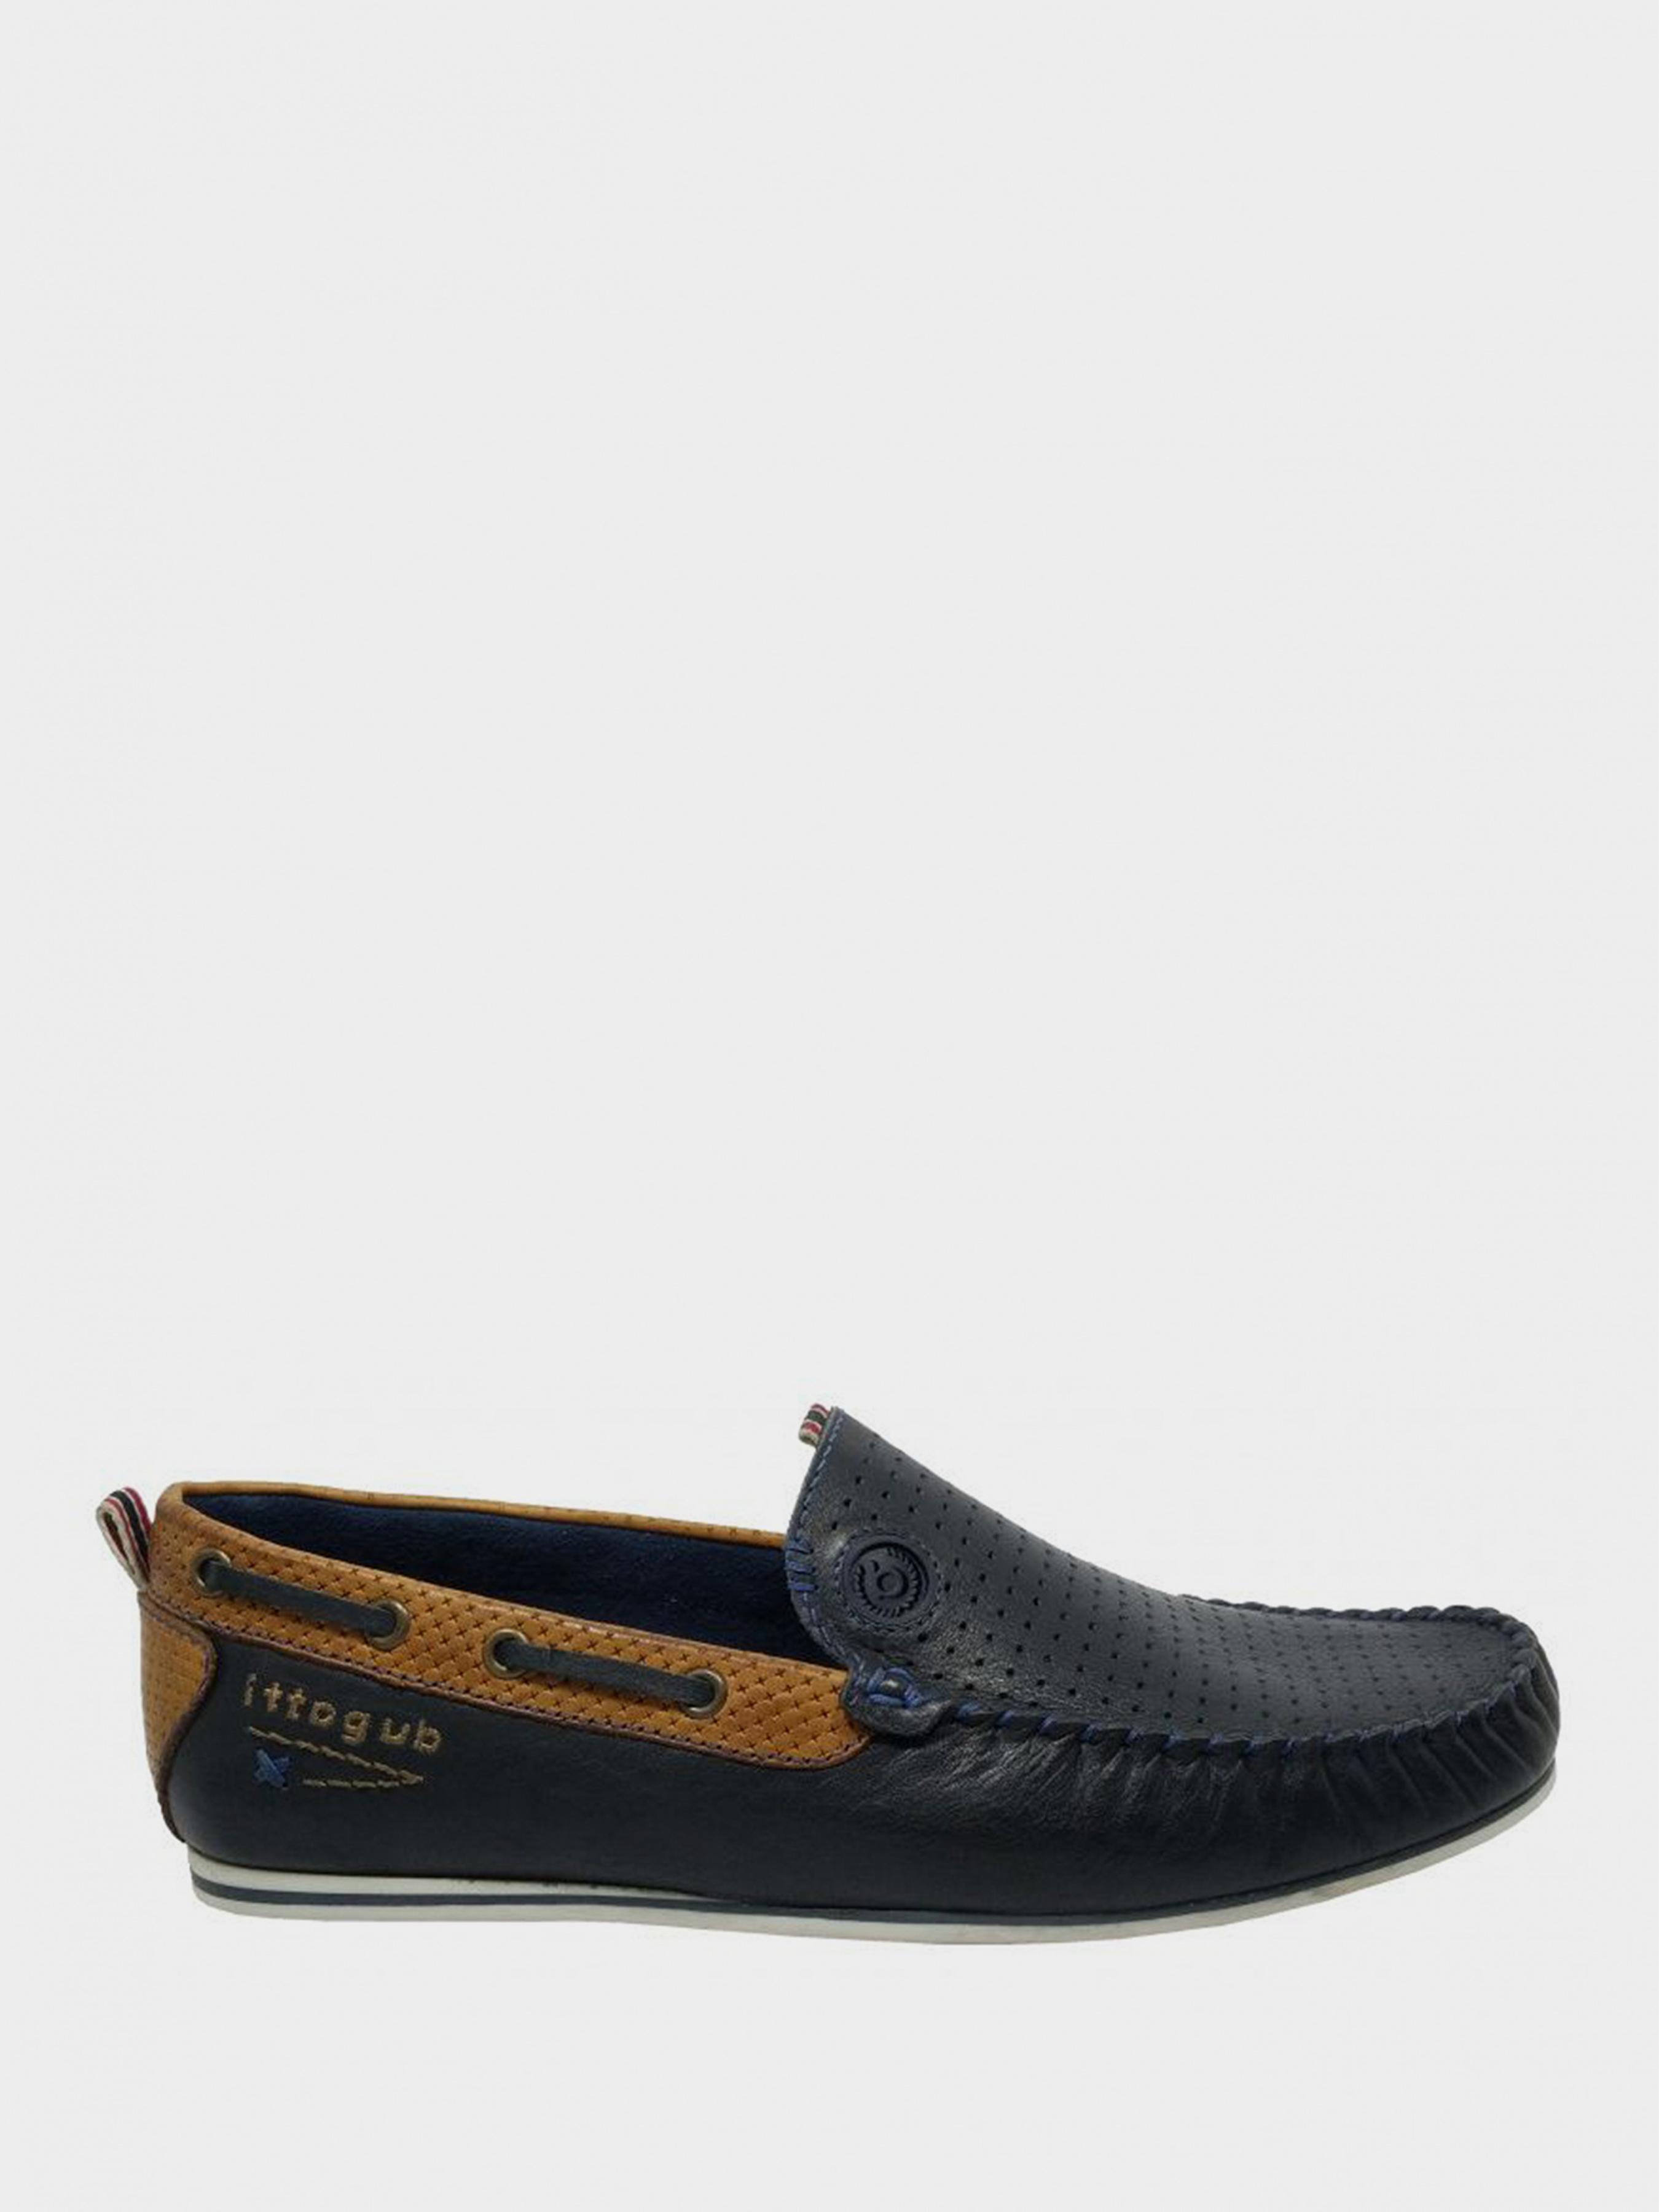 Мокасины для мужчин Bugatti YD184 размерная сетка обуви, 2017